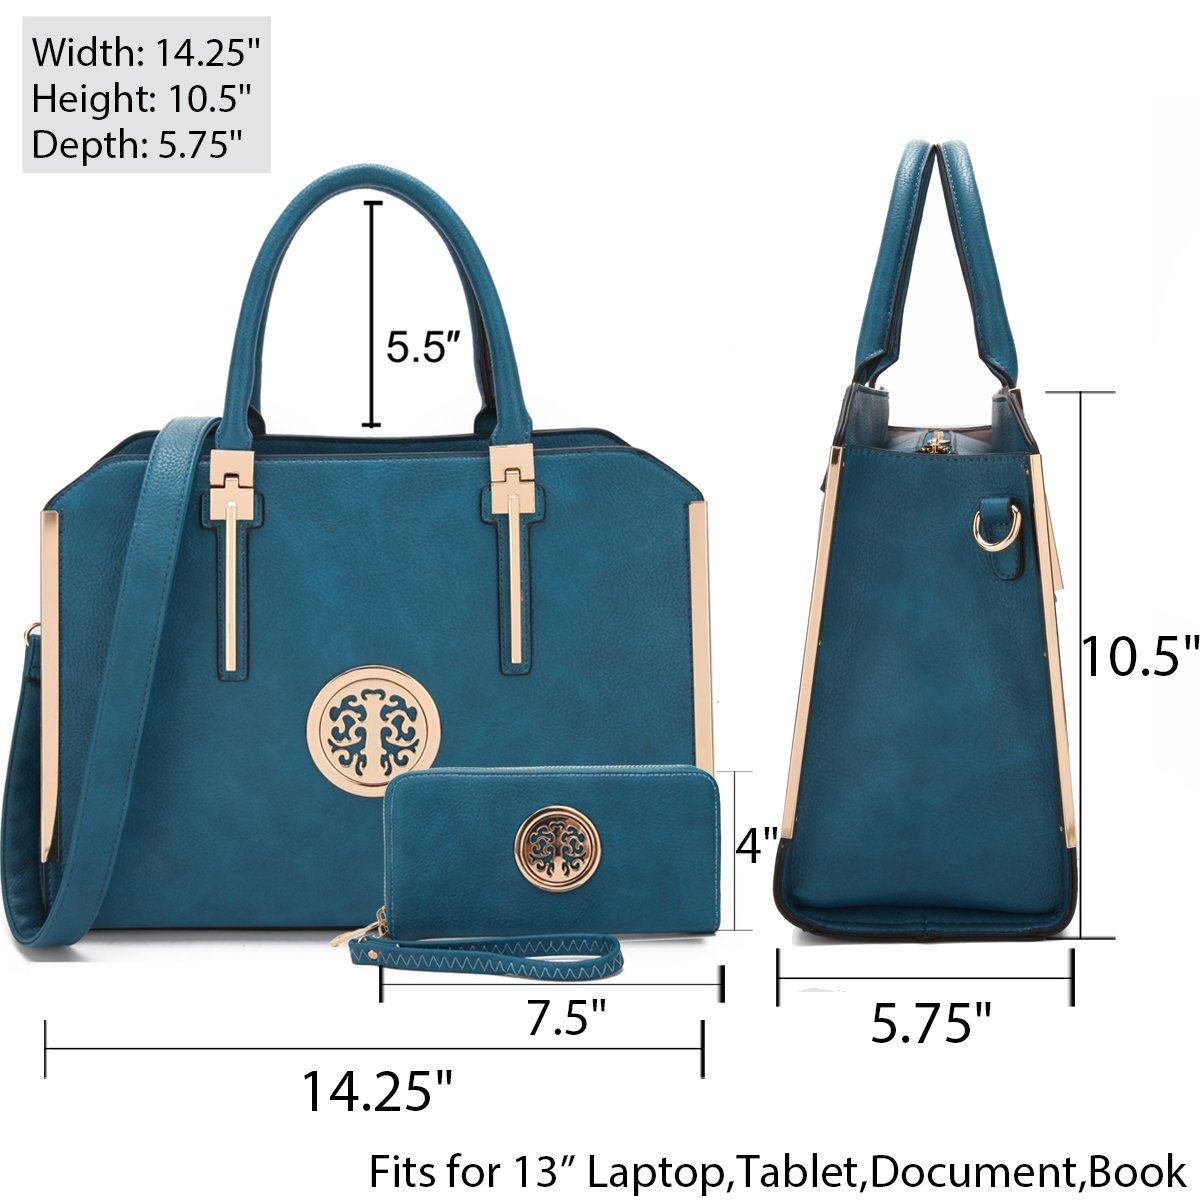 3d02af89380 MMK Womens Designer Handbags Tote Bag Satchel handbag Shoulder Bags Tote  Purse XL-09-